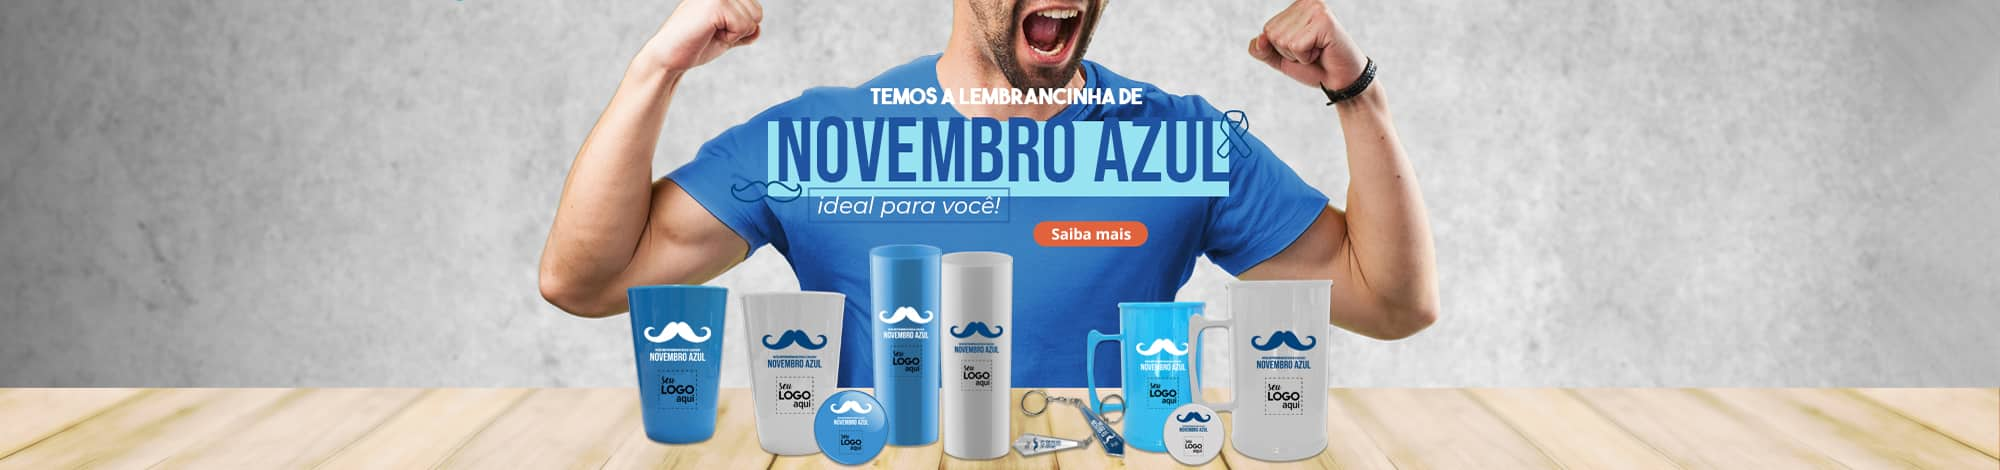 Lembrancinhas para Novembro Azul 22